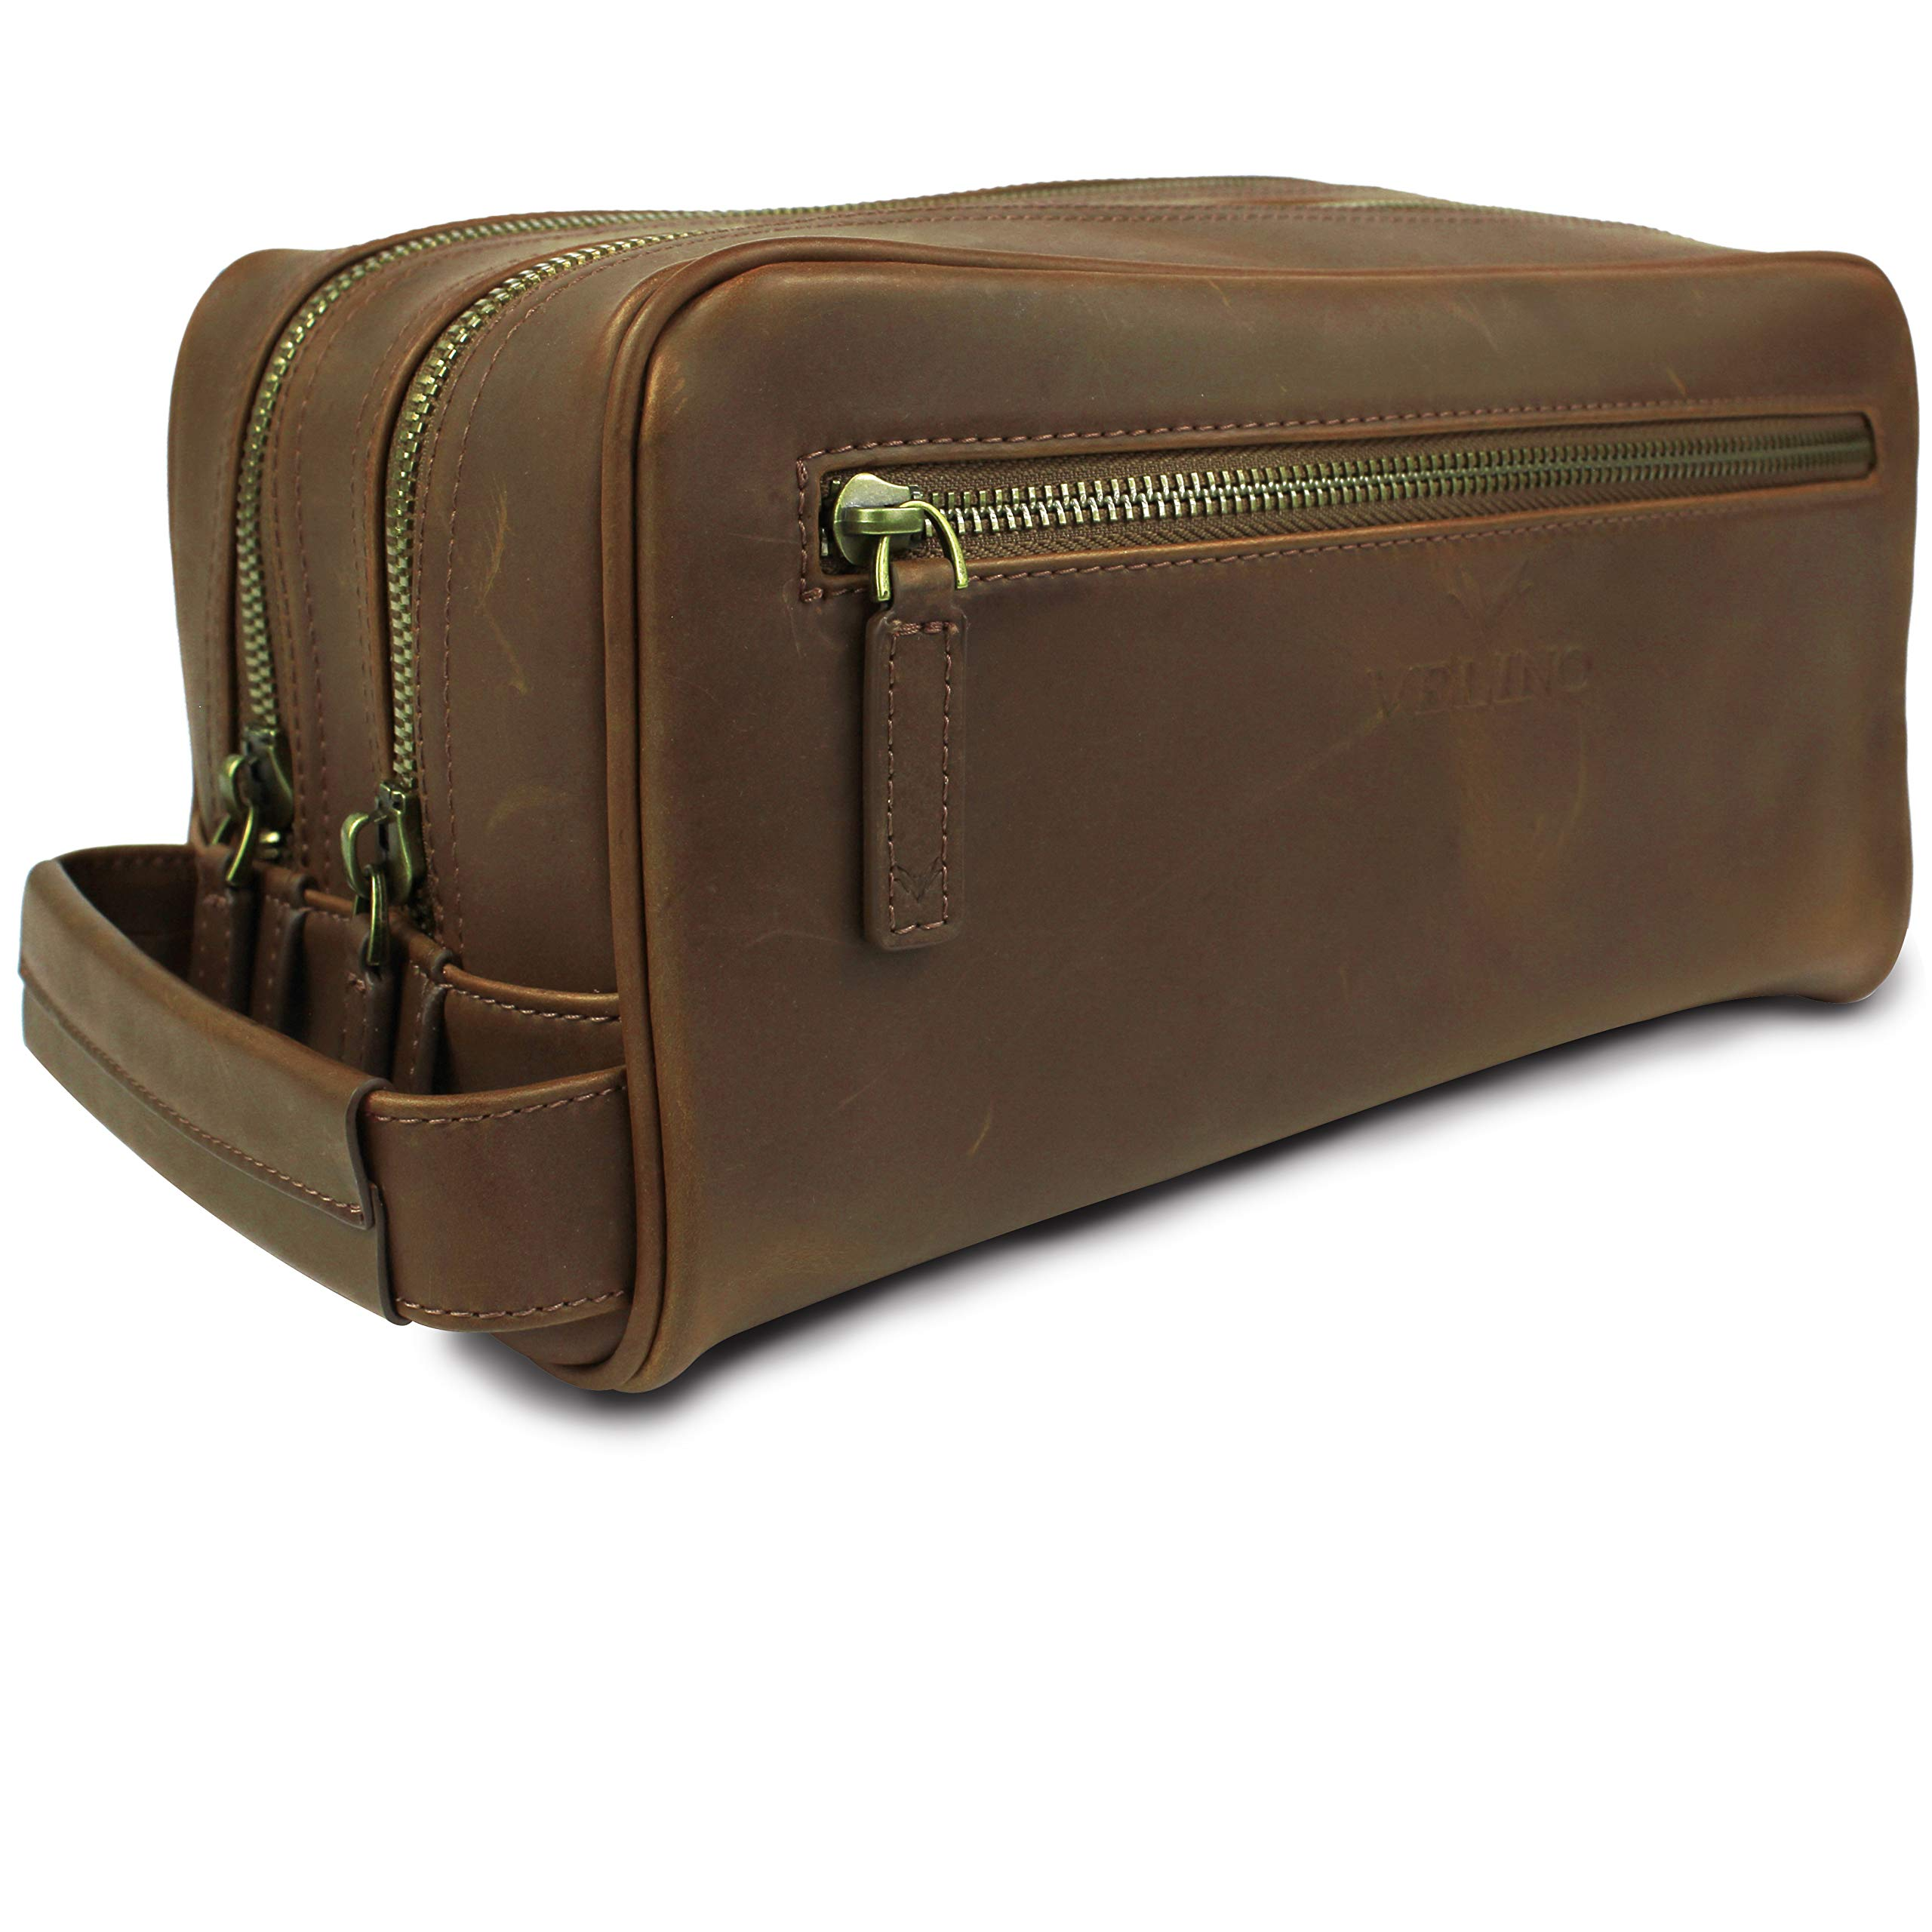 Velino Handmade Genuine Buffalo Leather Unisex Toiletry Bag Travel Dopp Kit Grooming and Shaving Kit ~ Gift for Men Women ~ Hanging Zippered Cosmetic Pouch ~ Bathroom Makeup Case by Velino